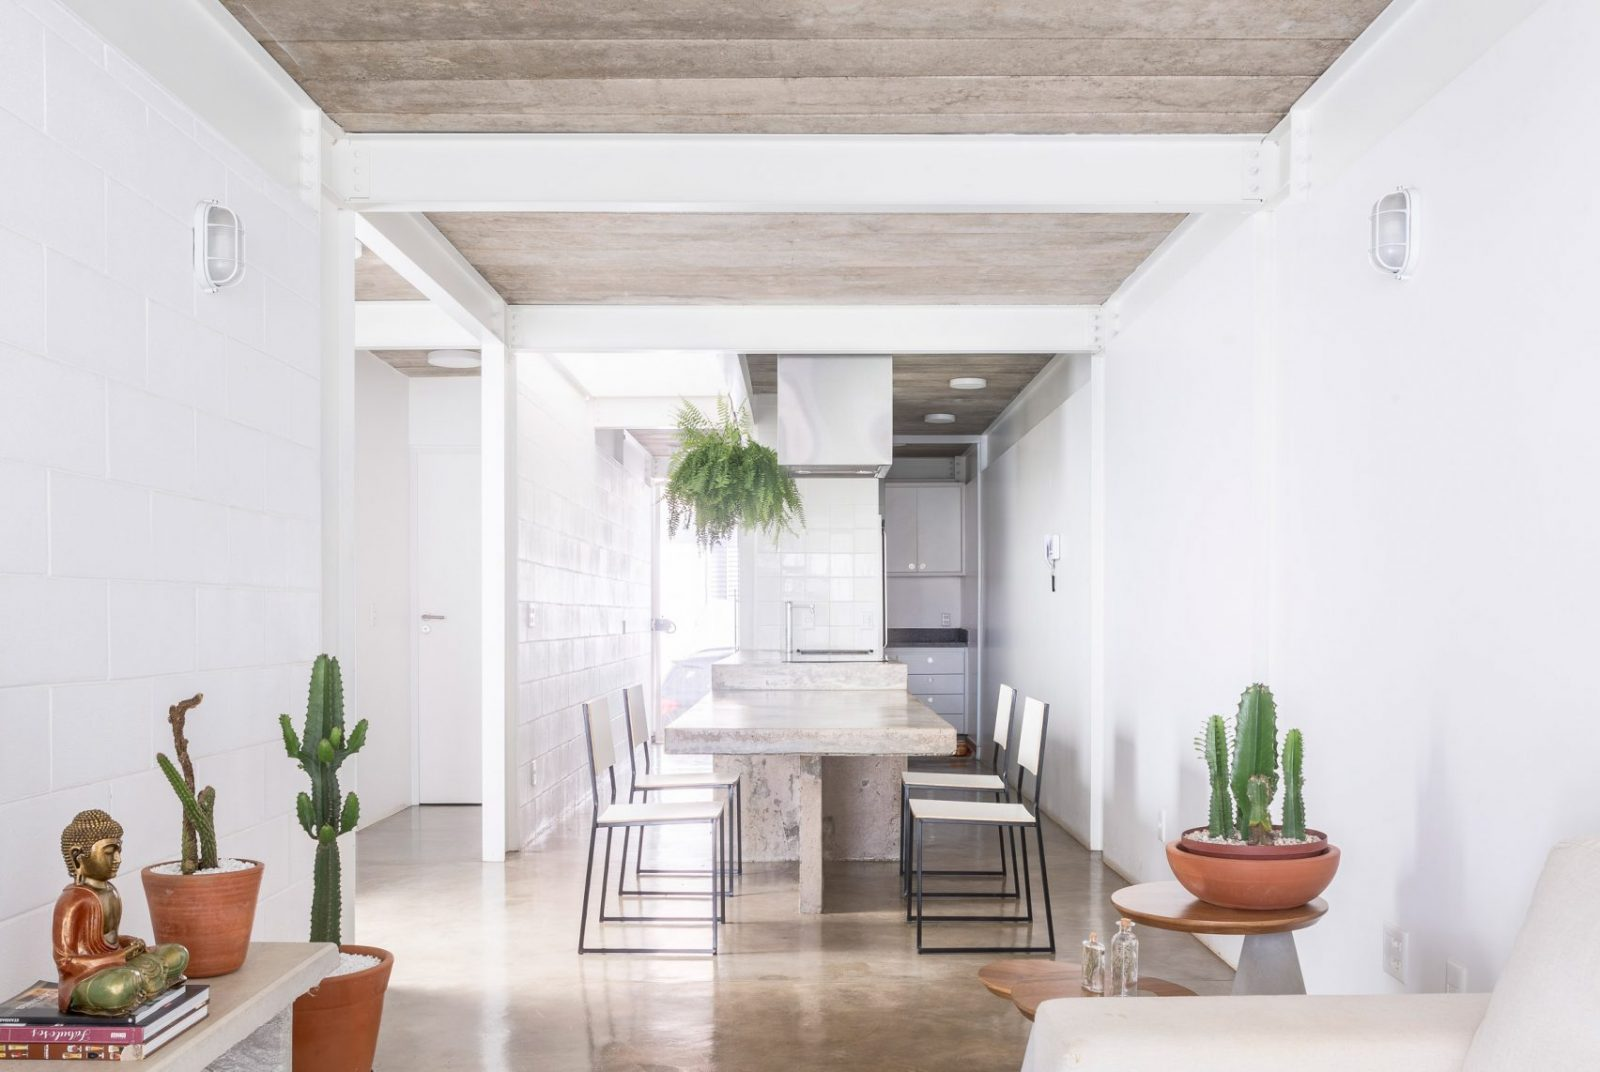 casa-711h-bloco-arquitetos-Joana-Franca-03-1600x1072